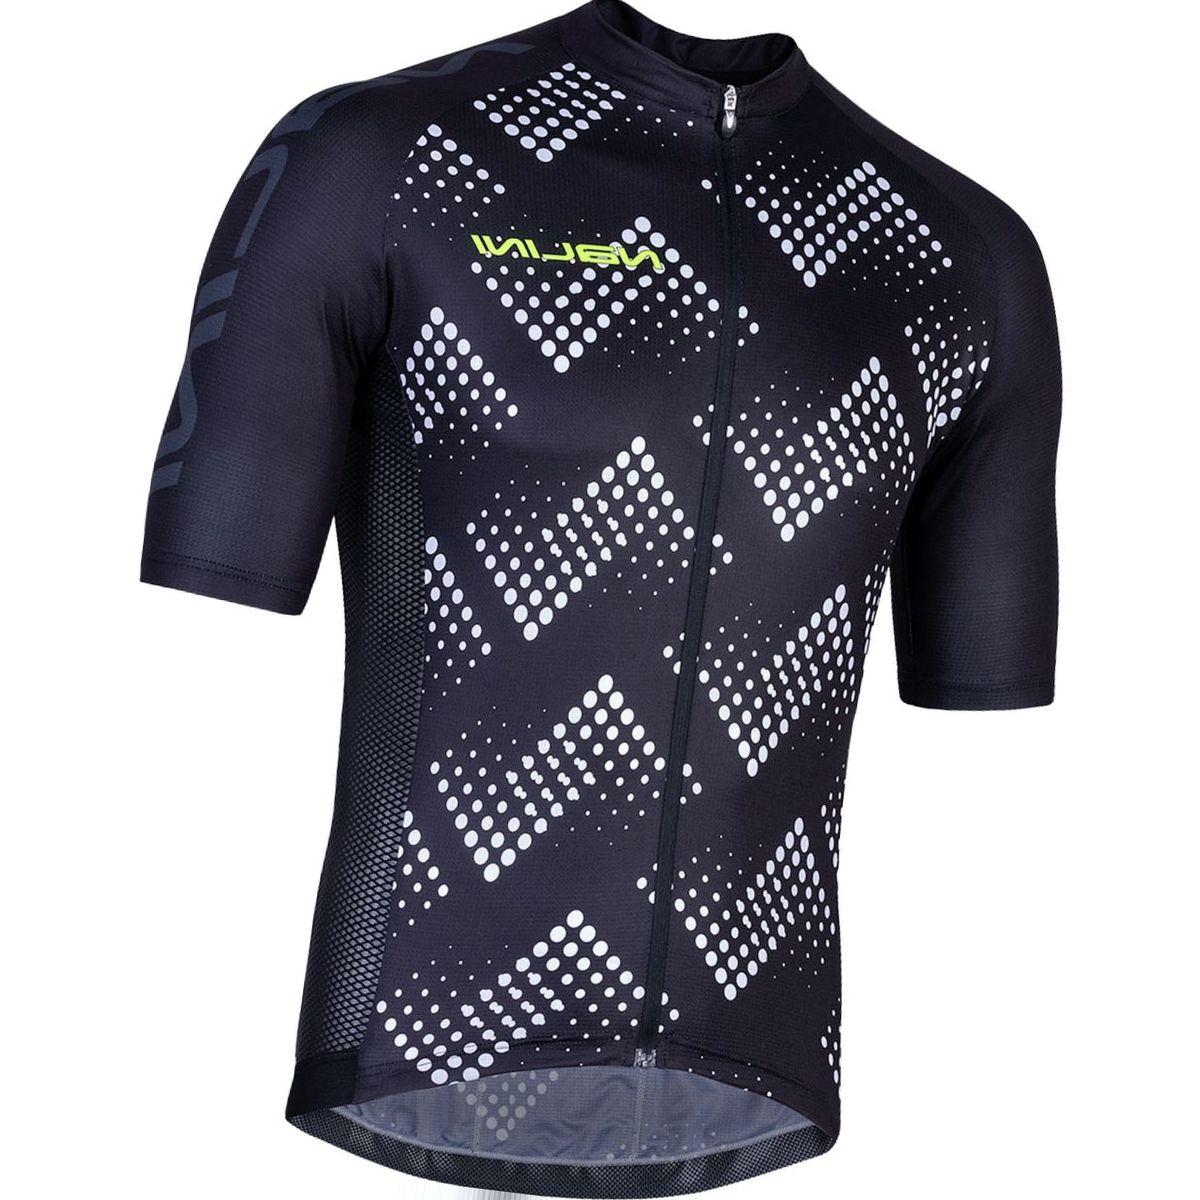 Nalini AIS Podio 2.0 Short-Sleeve Jersey - Men's